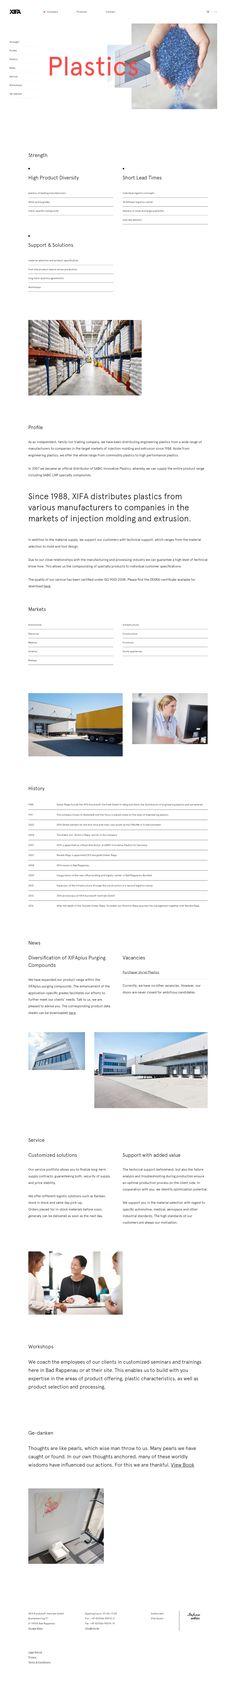 XIFA — Distributor of plastics of known manufacturers